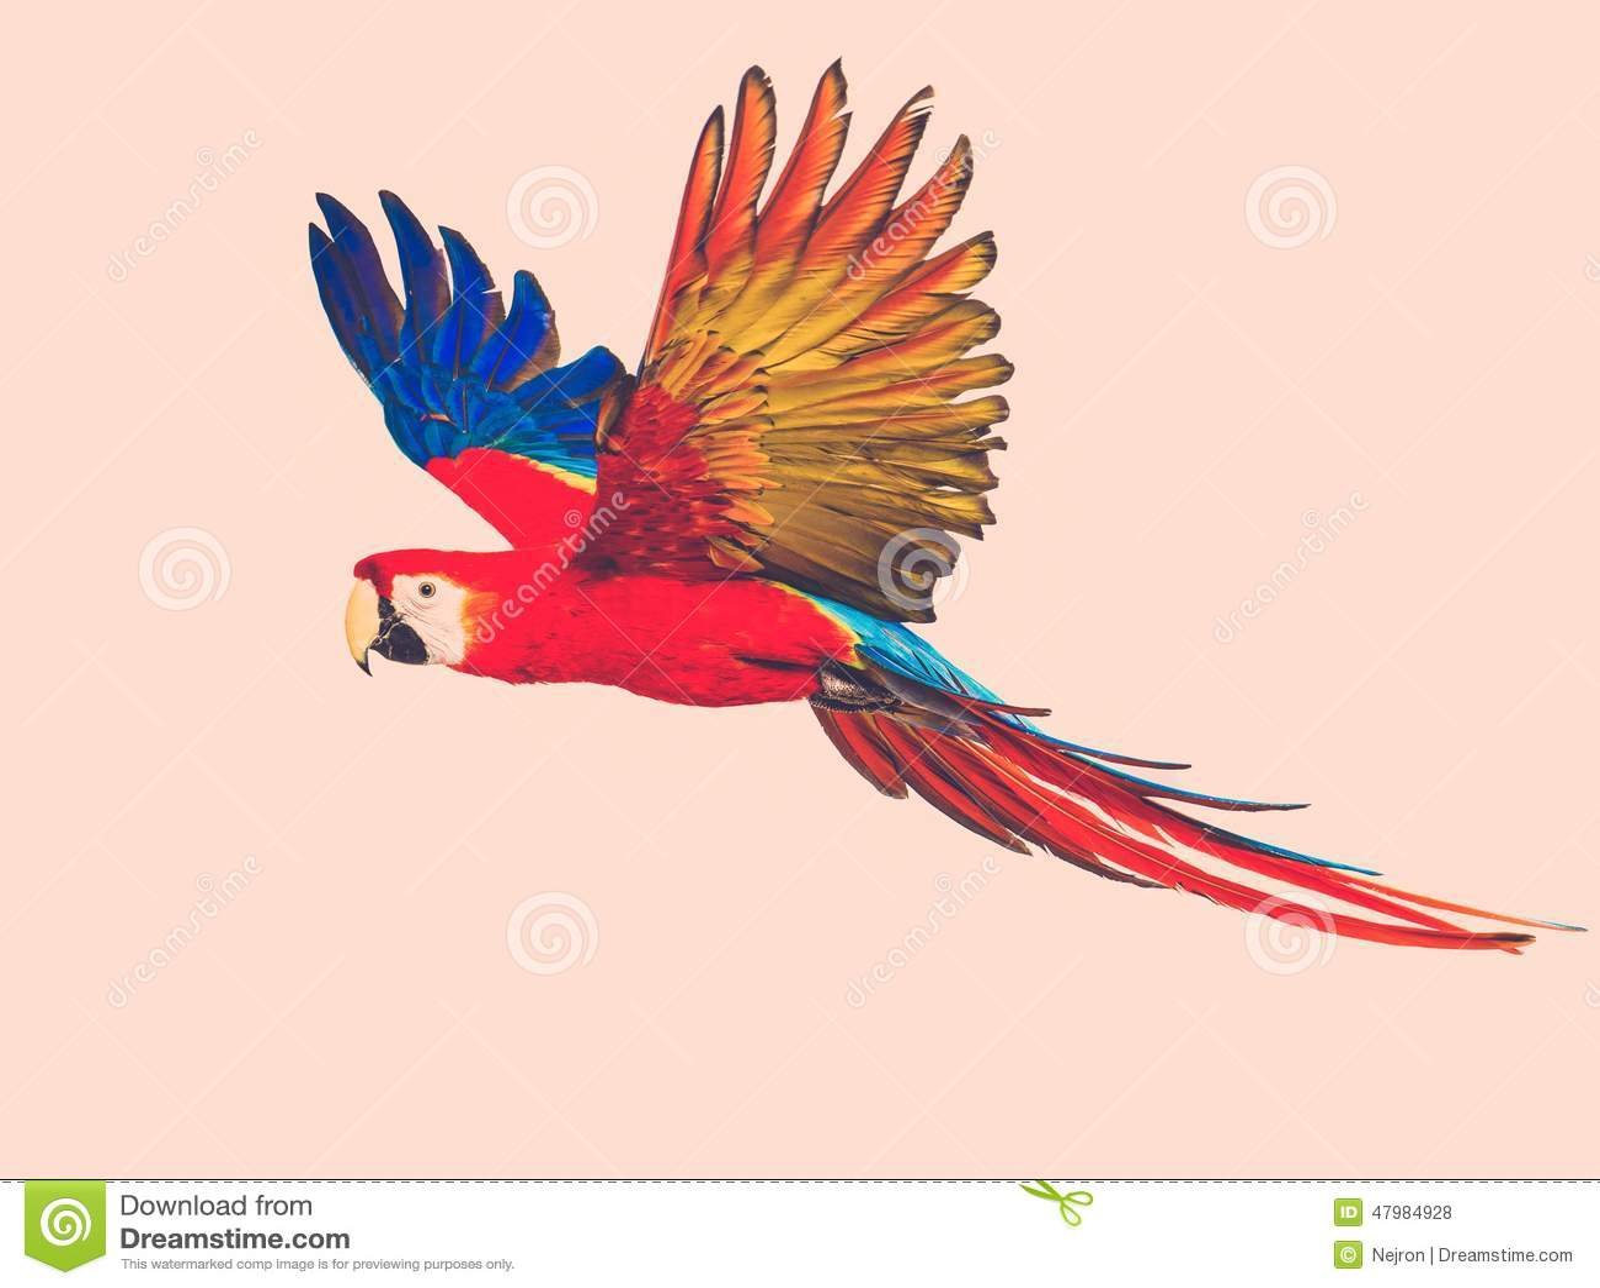 Kleurrijke vliegende papegaai